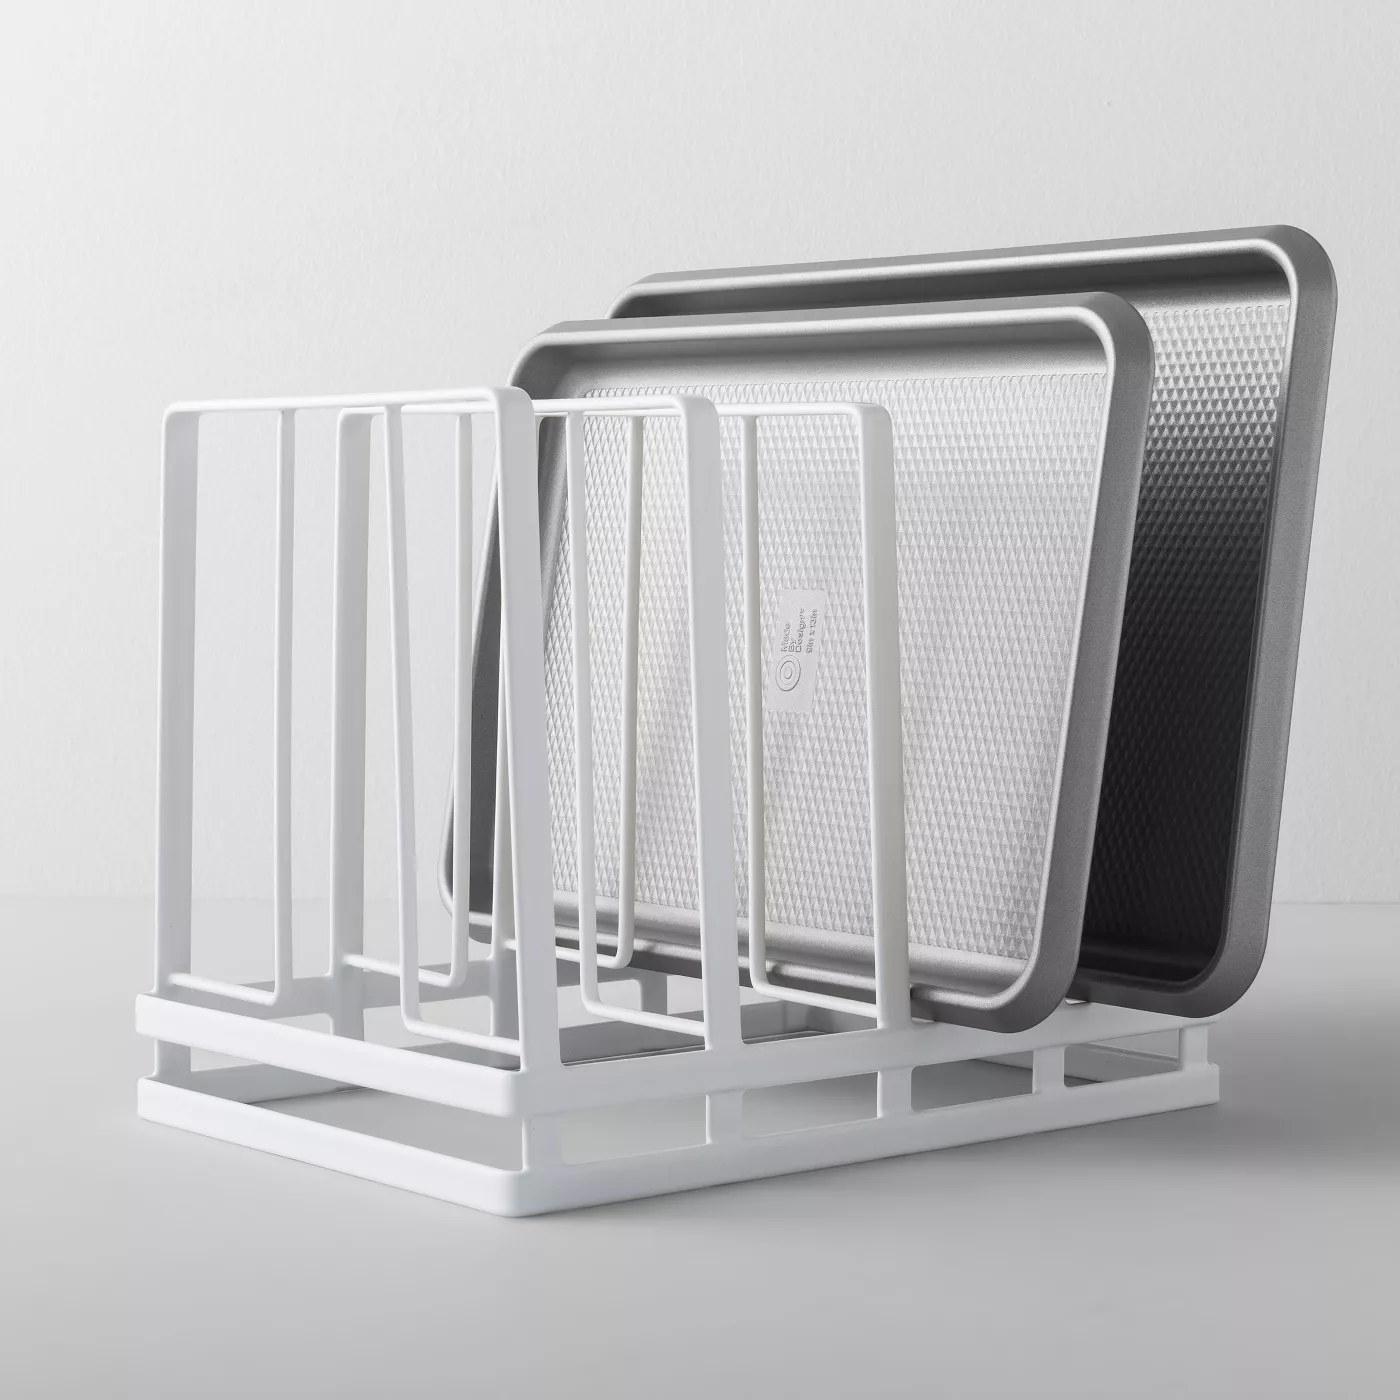 A 4-piece pan organizer